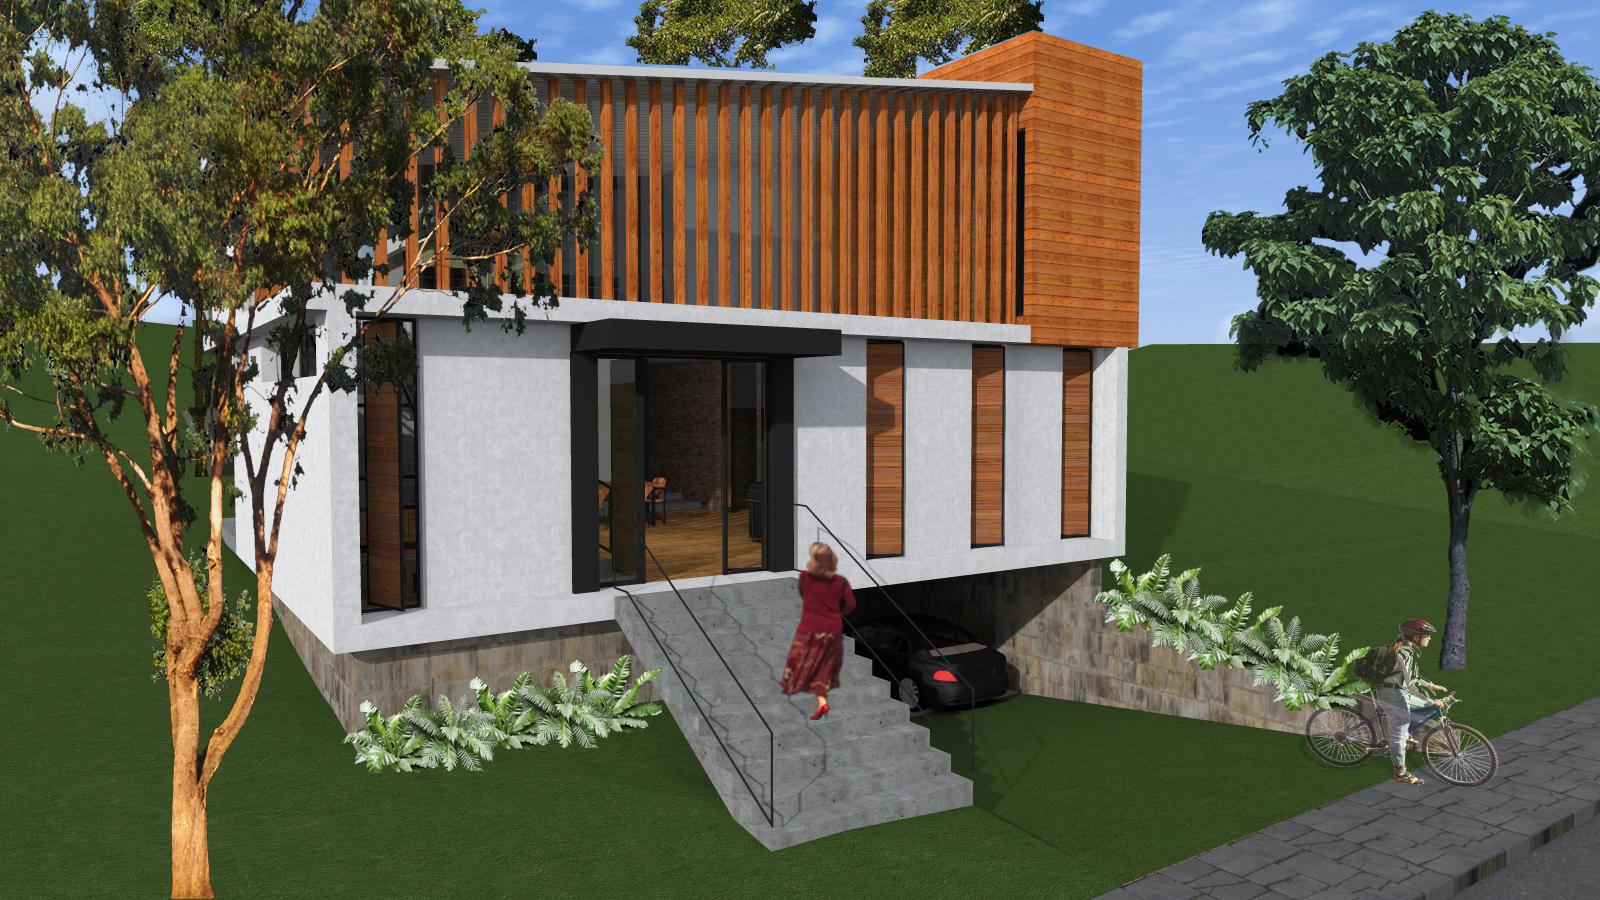 CASA ALPHAVILLE « TETO Arquitetura Sustentável e Paisagismo  #2459A7 1600x900 Arquitetura Sustentavel Banheiro